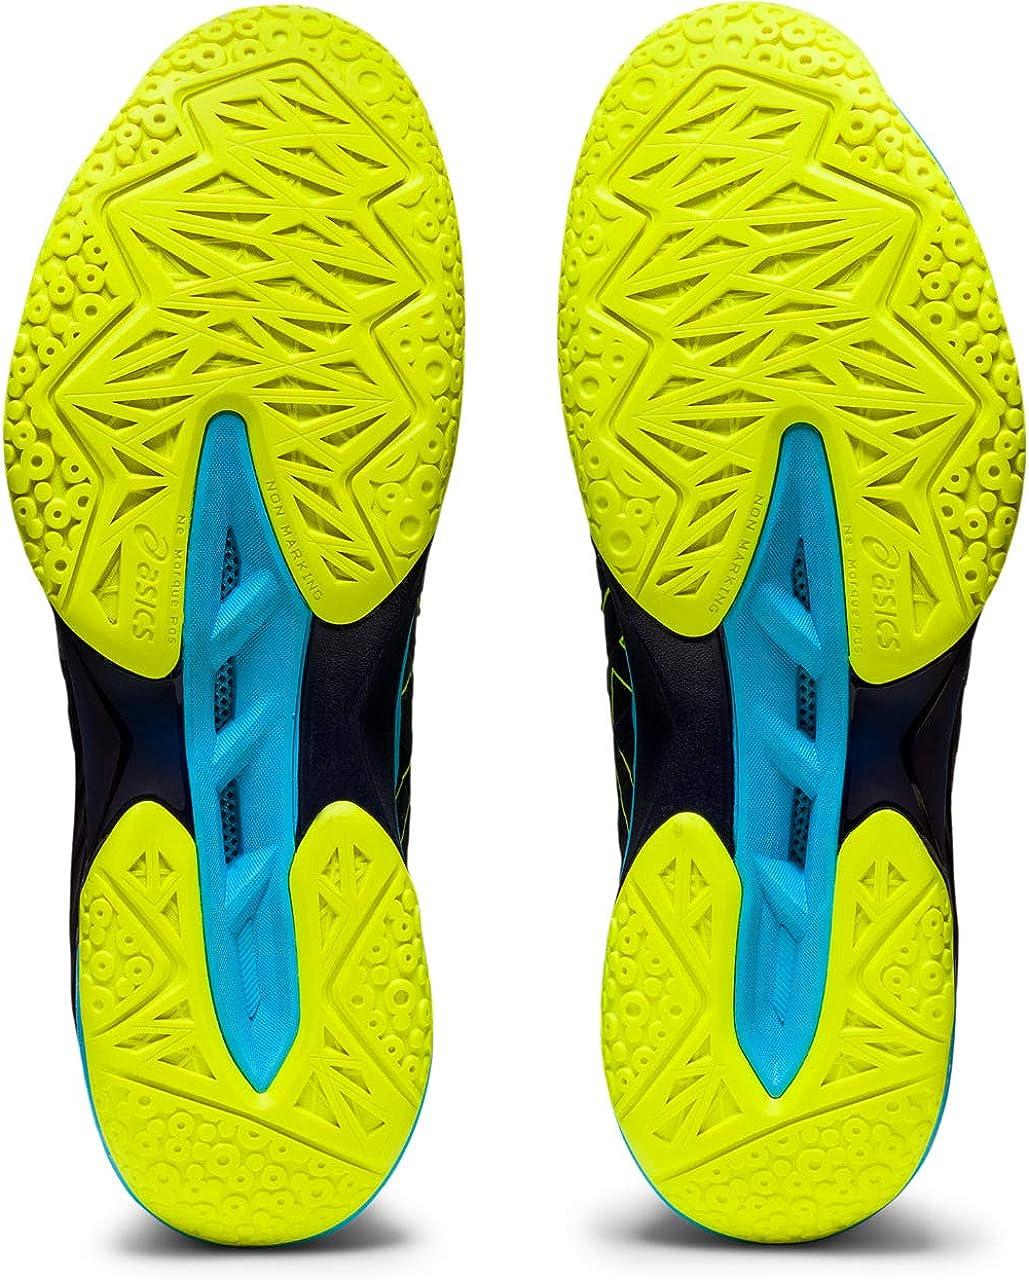 Handball Shoe Homme ASICS Blast FF